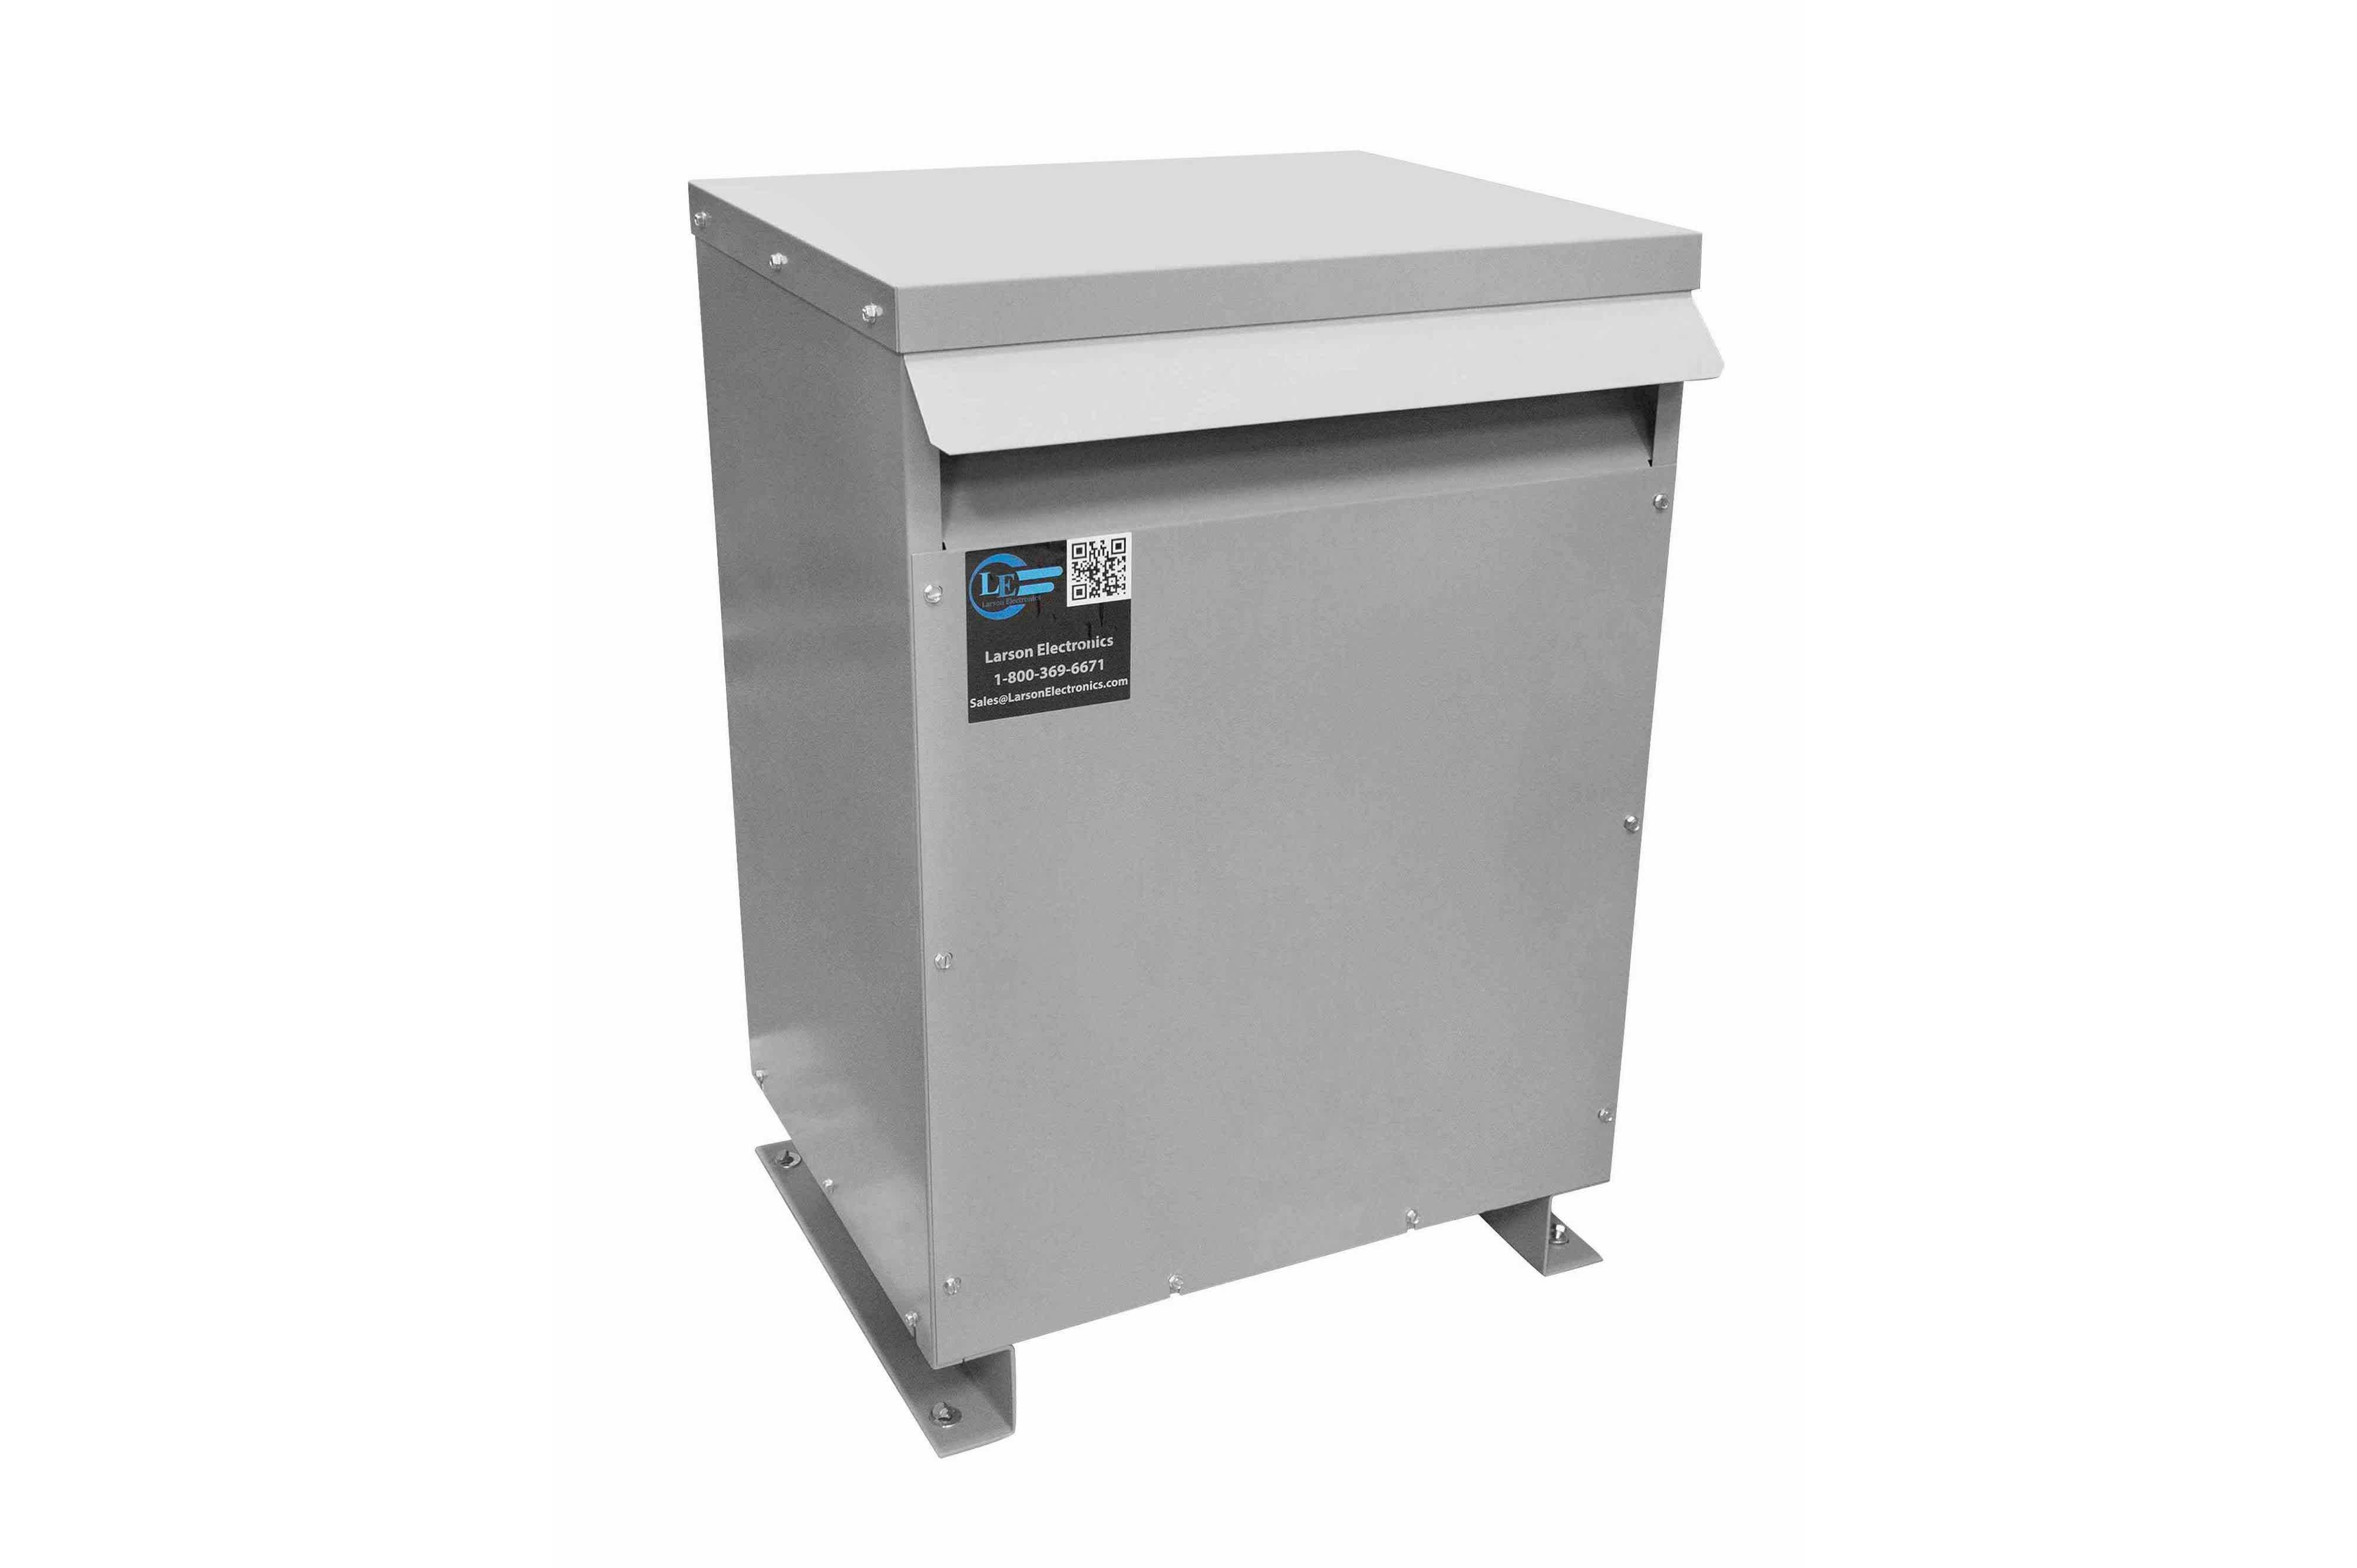 37.5 kVA 3PH Isolation Transformer, 460V Wye Primary, 380V Delta Secondary, N3R, Ventilated, 60 Hz